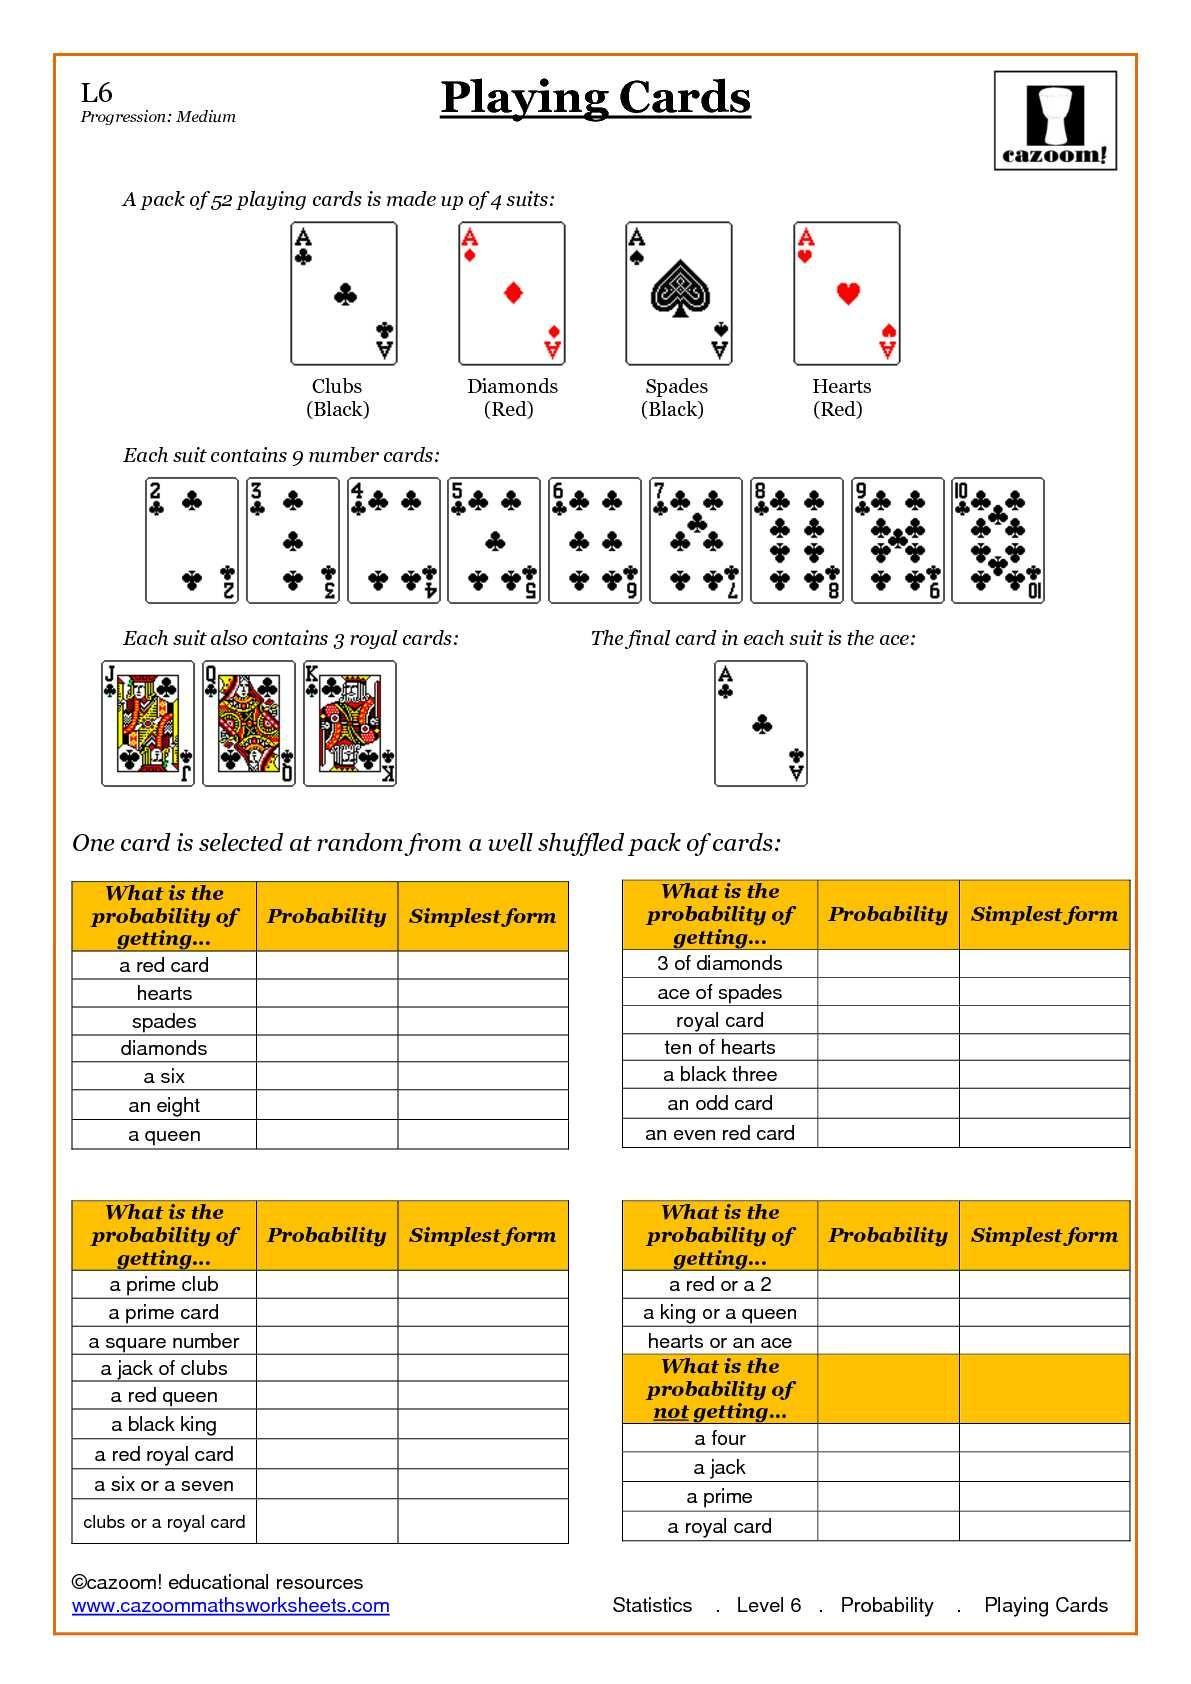 Statistic Maths Worksheets - Free Printable Statistics Worksheets